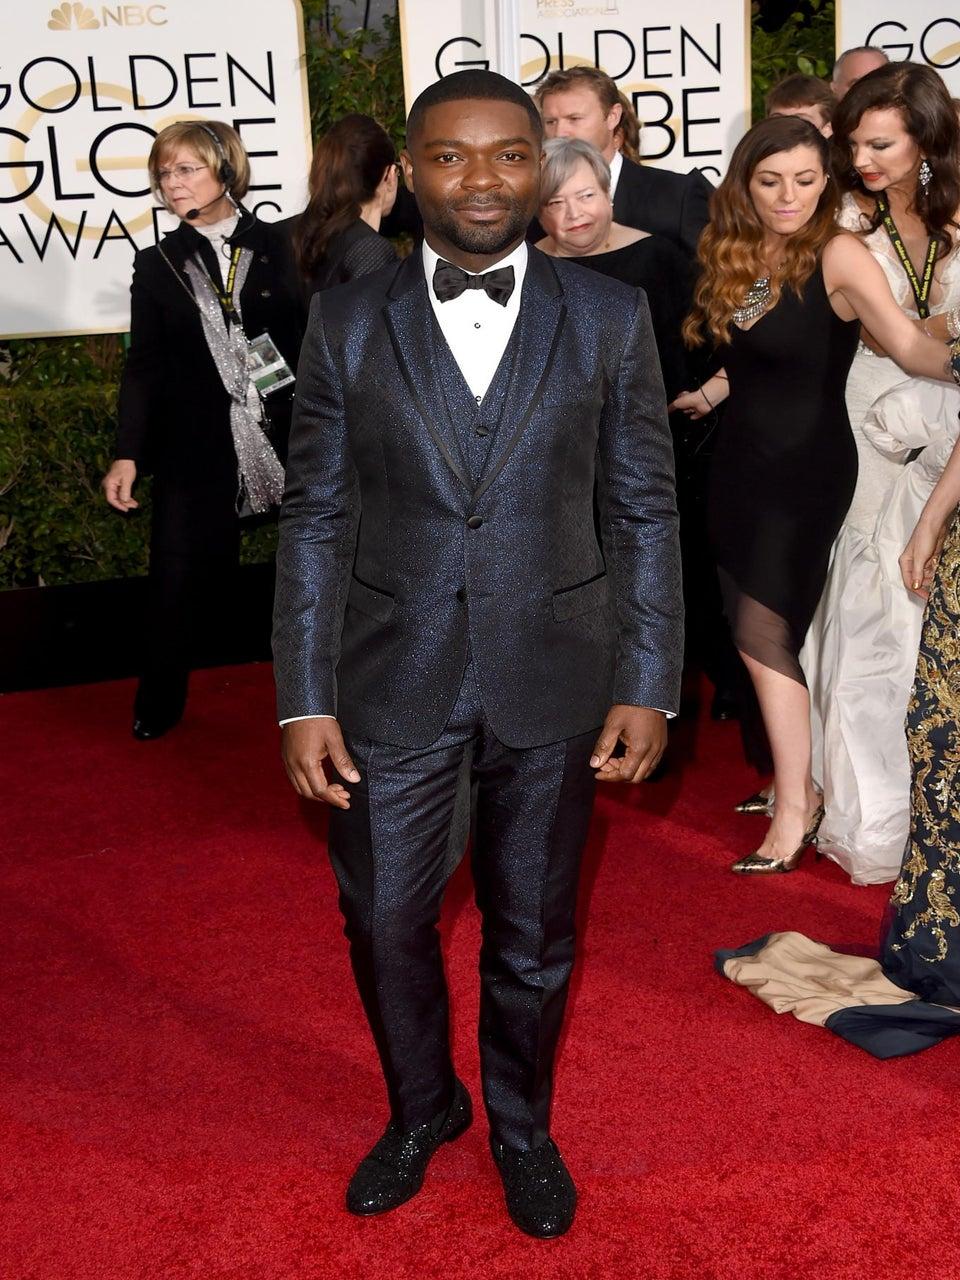 David Oyelowo on Oscars Snub: 'These Things Happen'